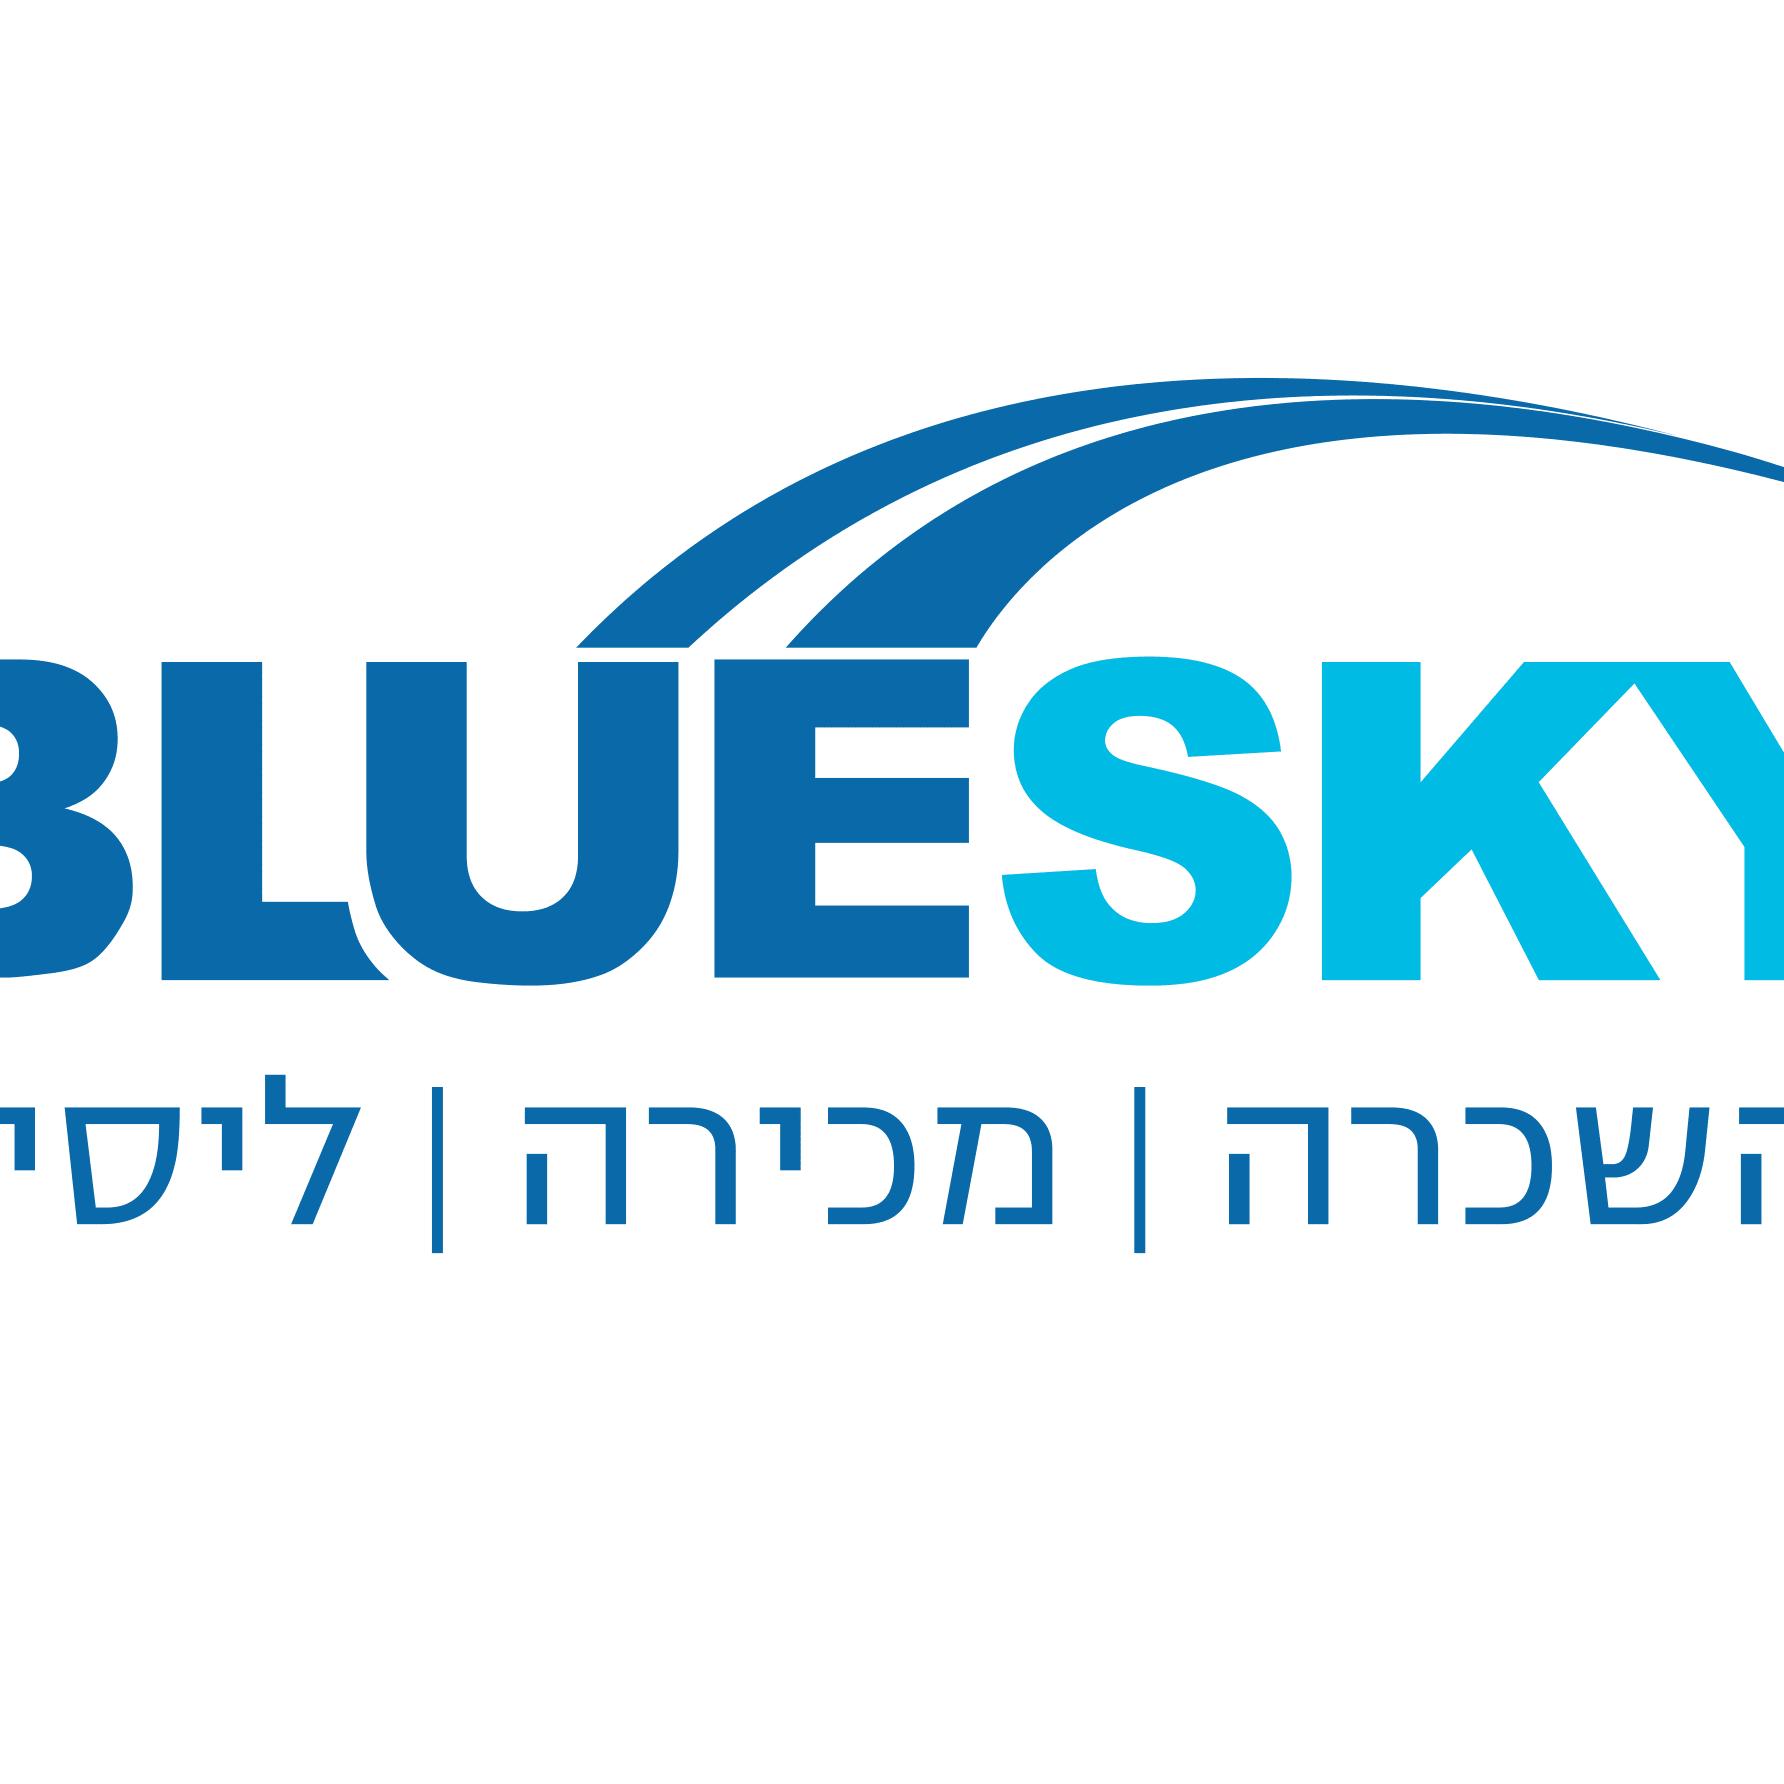 BLUE SKY  - השכרה, מכירה וליסינג story